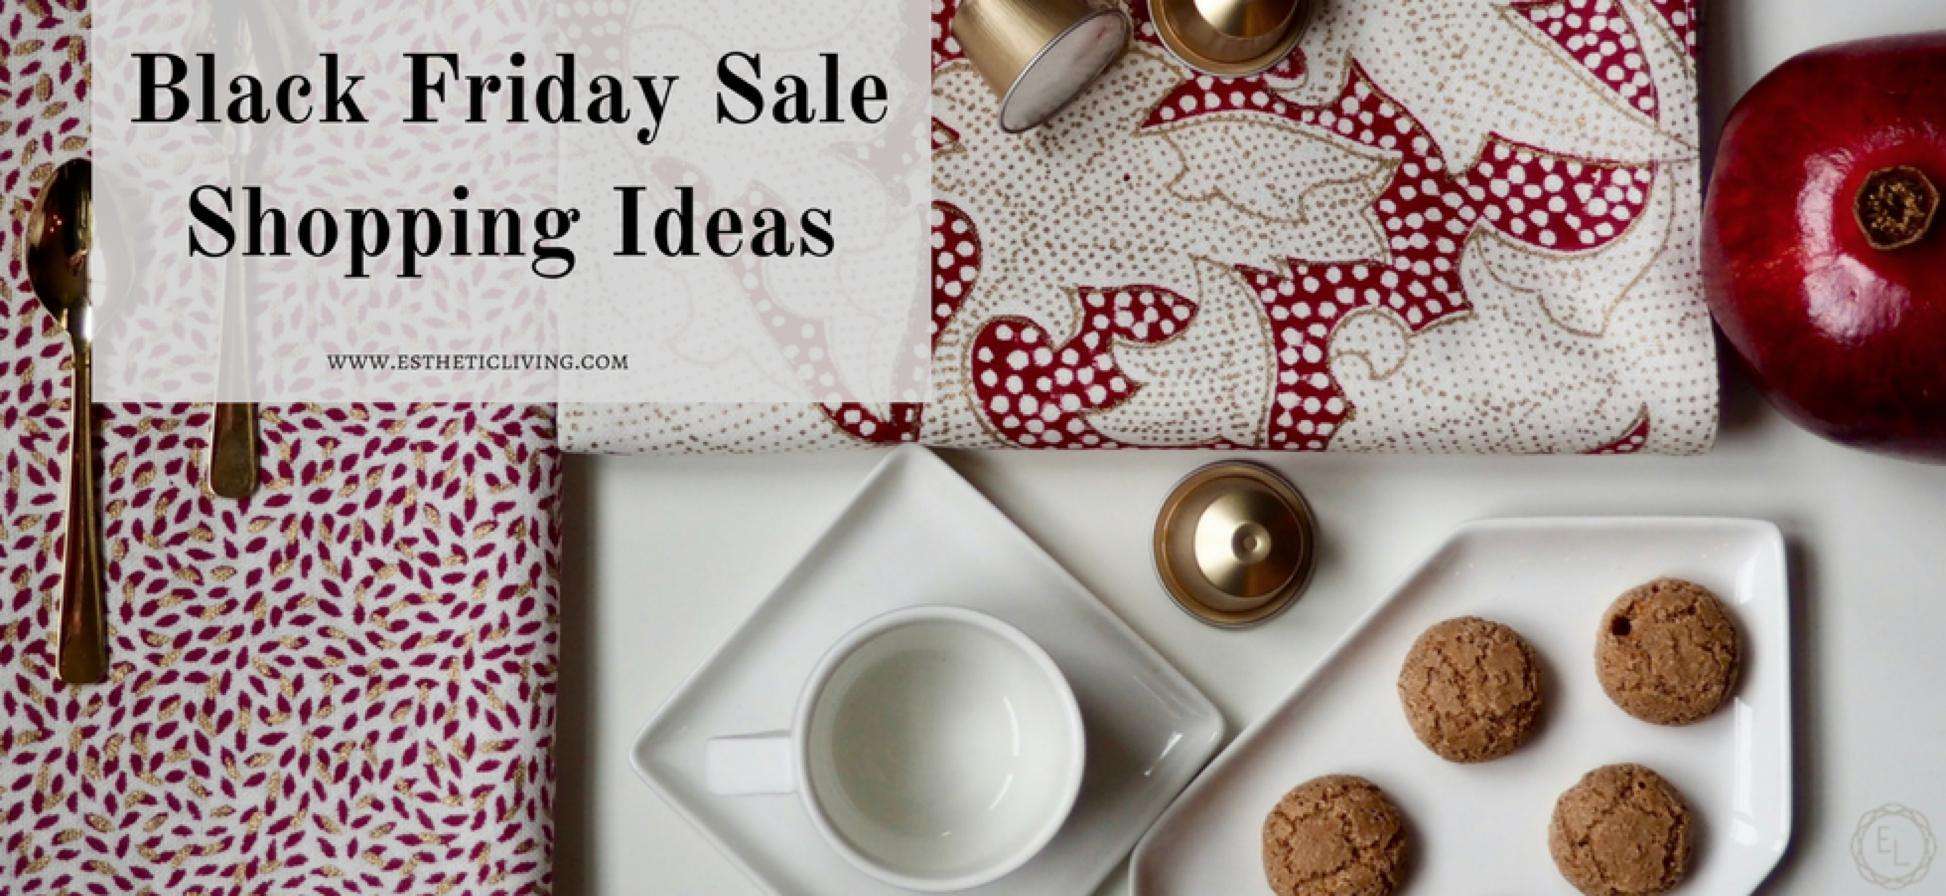 Esthetic Living Black Friday Sale